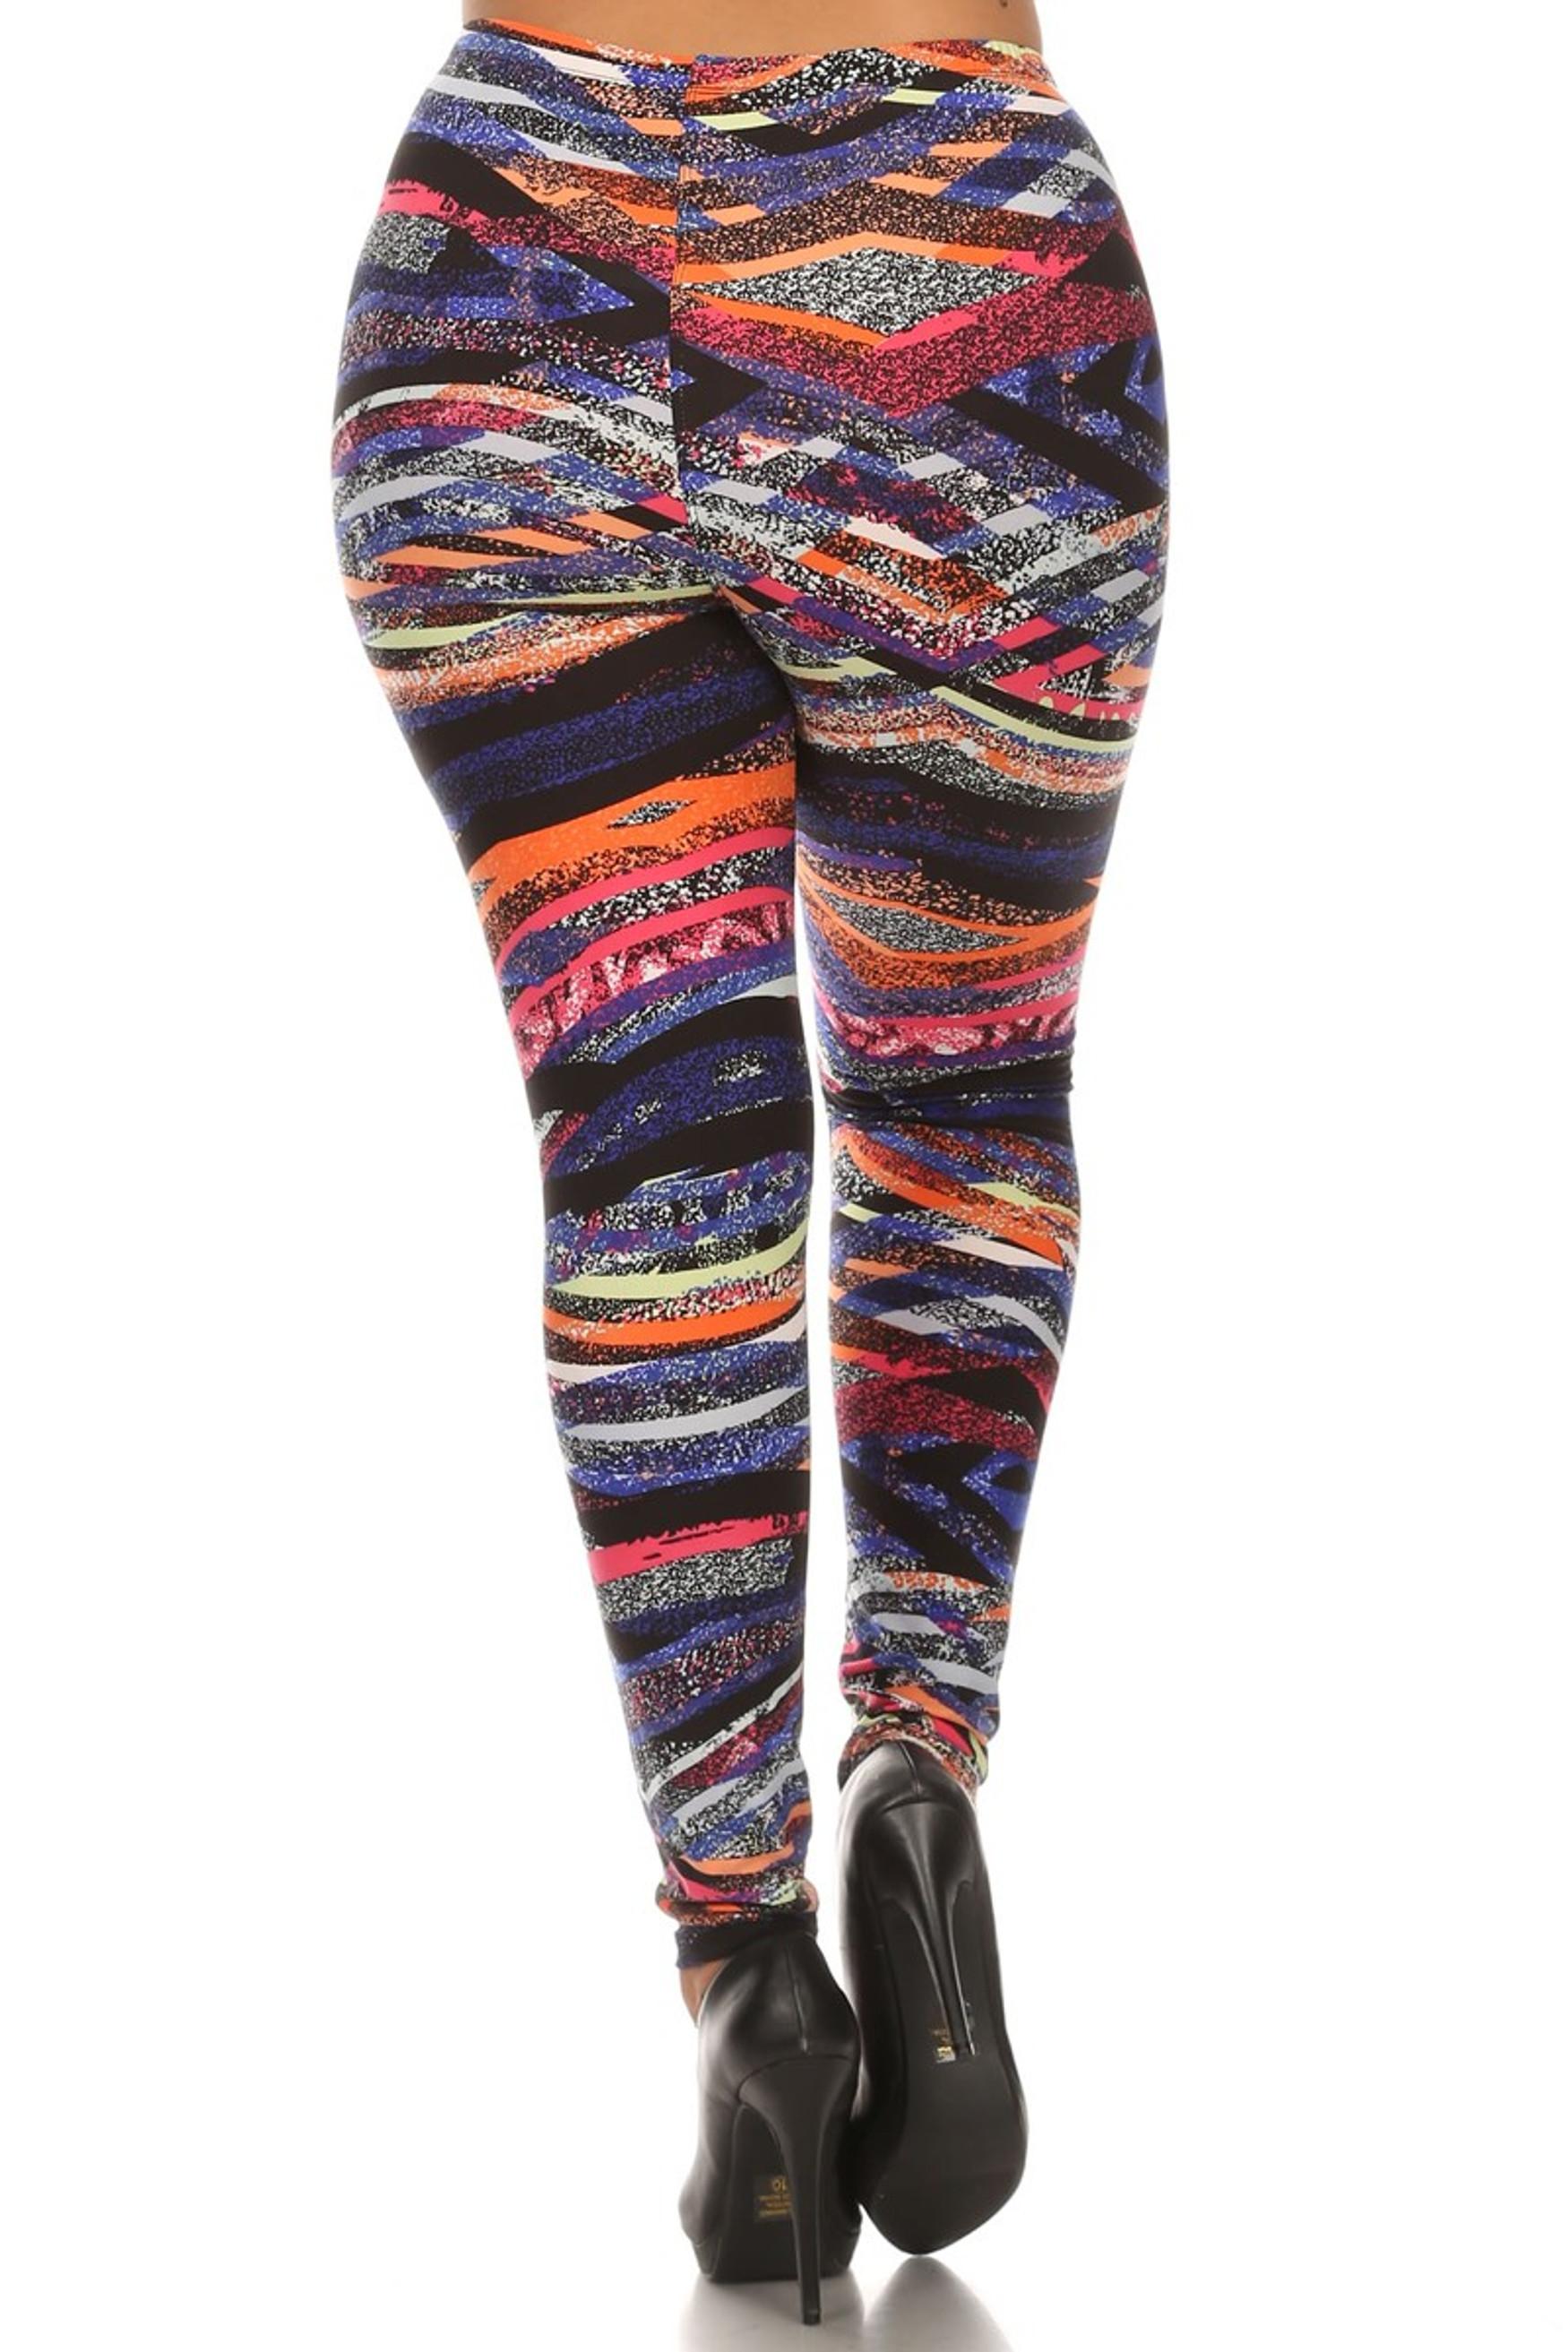 Back side image of Brushed Colorful Bands Plus Size Leggings